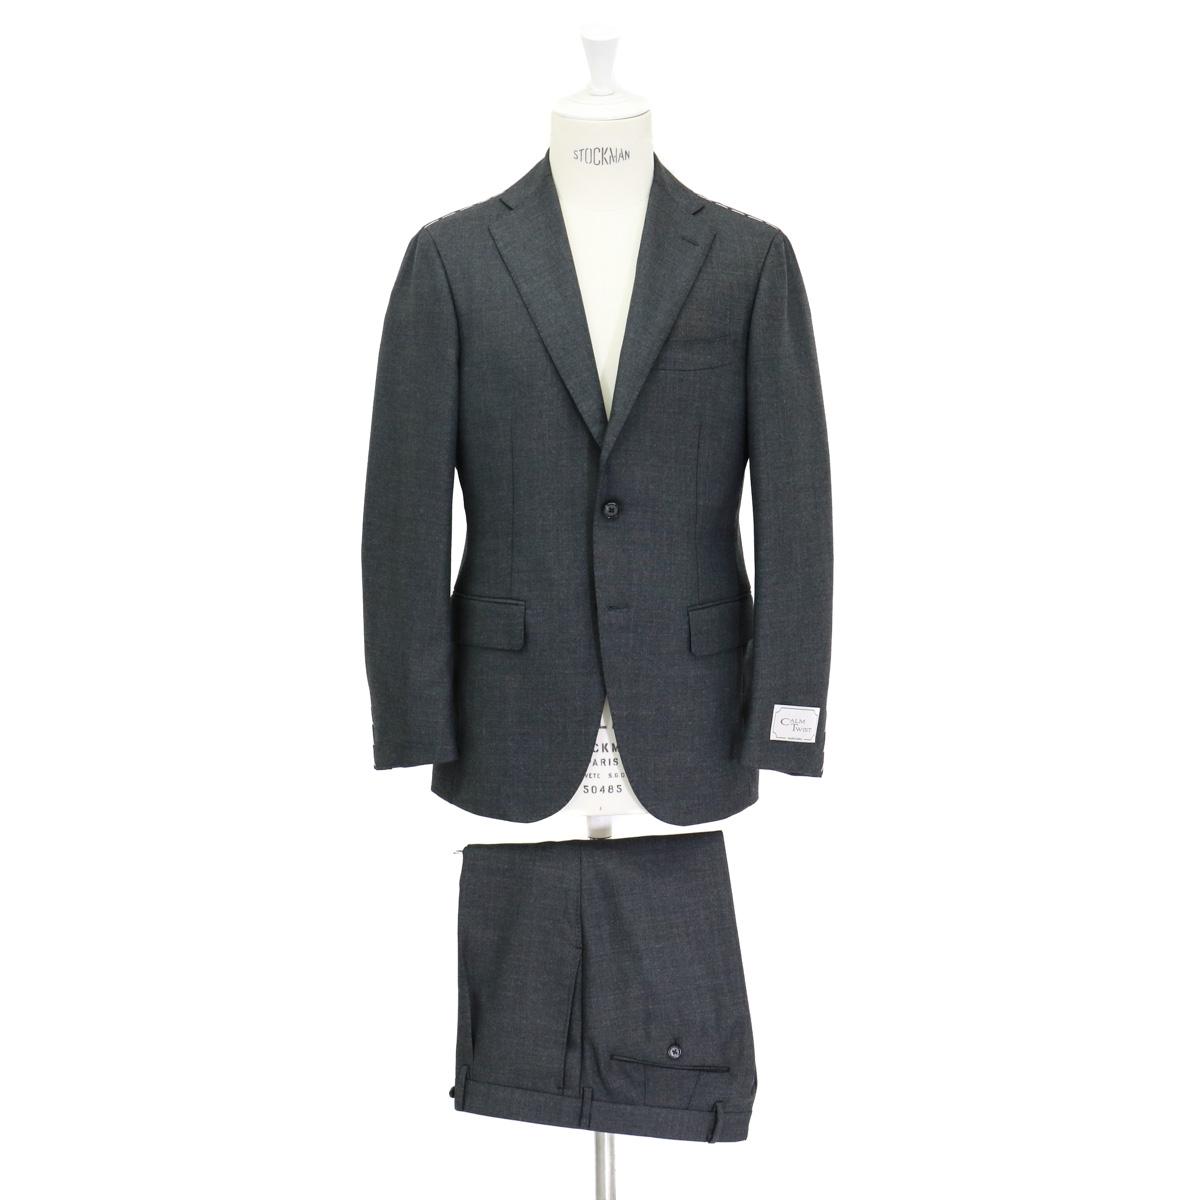 RING JACKET リングヂャケットModel No-184AH S-172HCALM TWISTスーツ【チャコールグレ―】